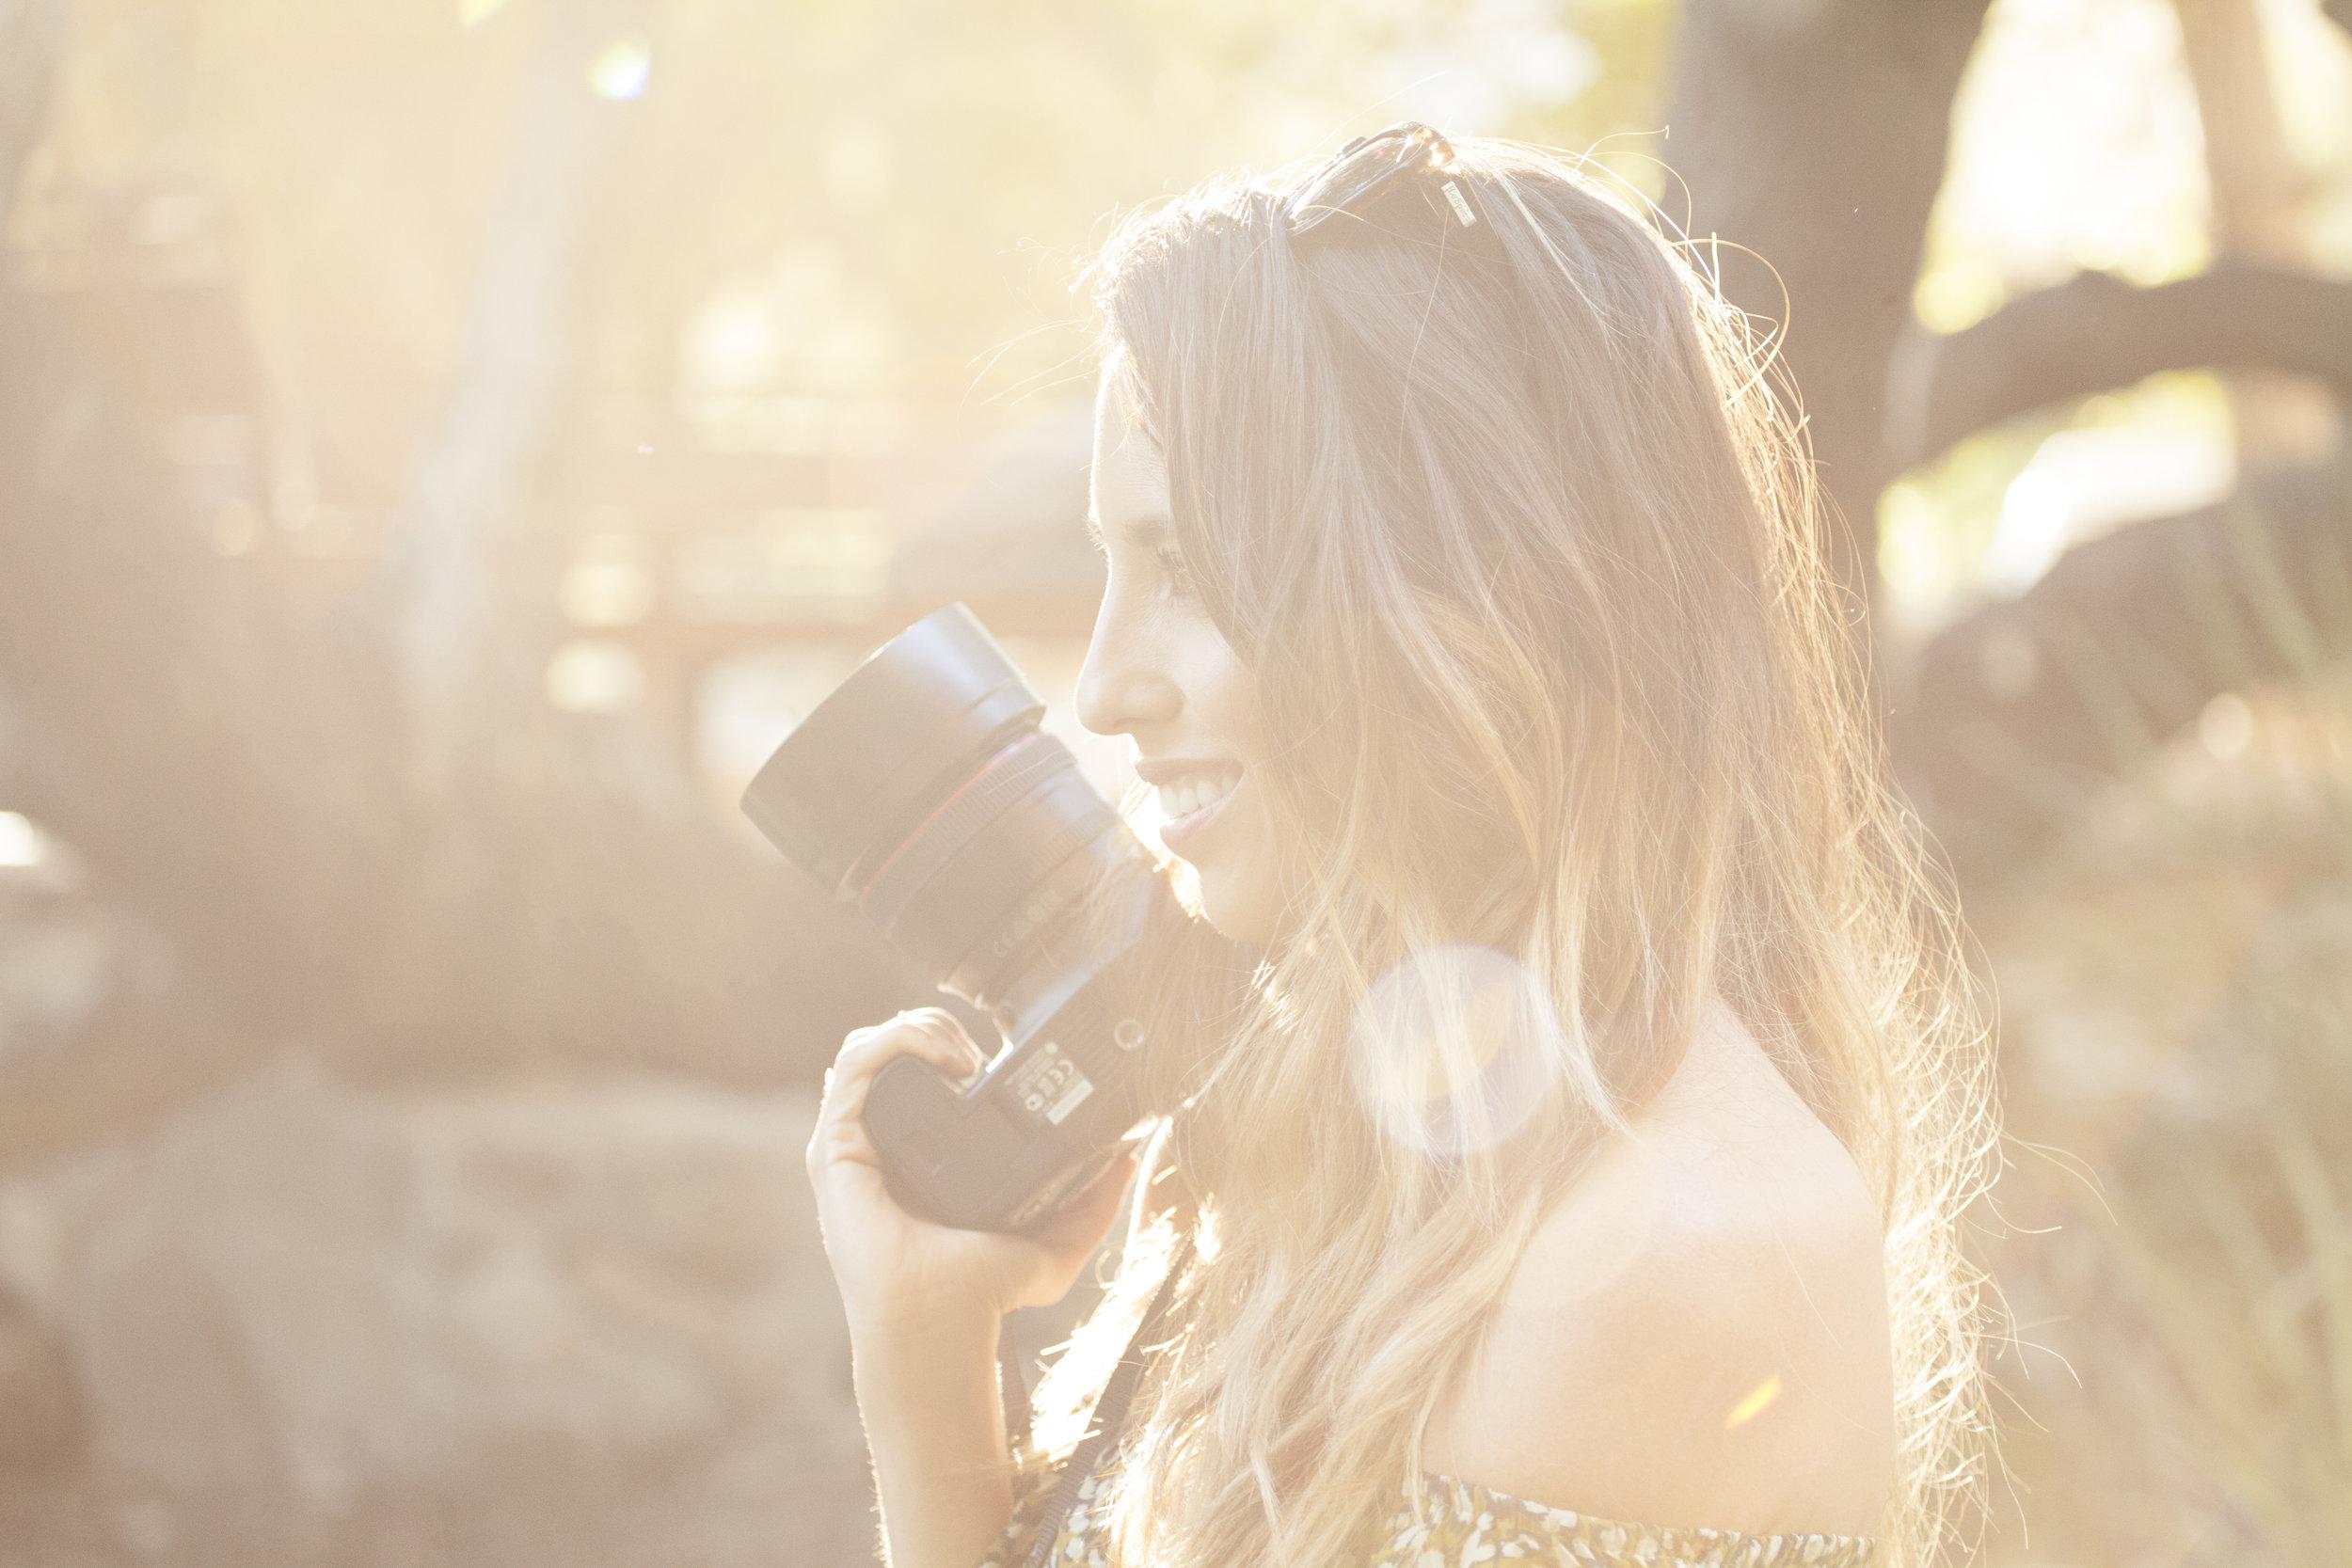 Sandiegoweddingphotographer